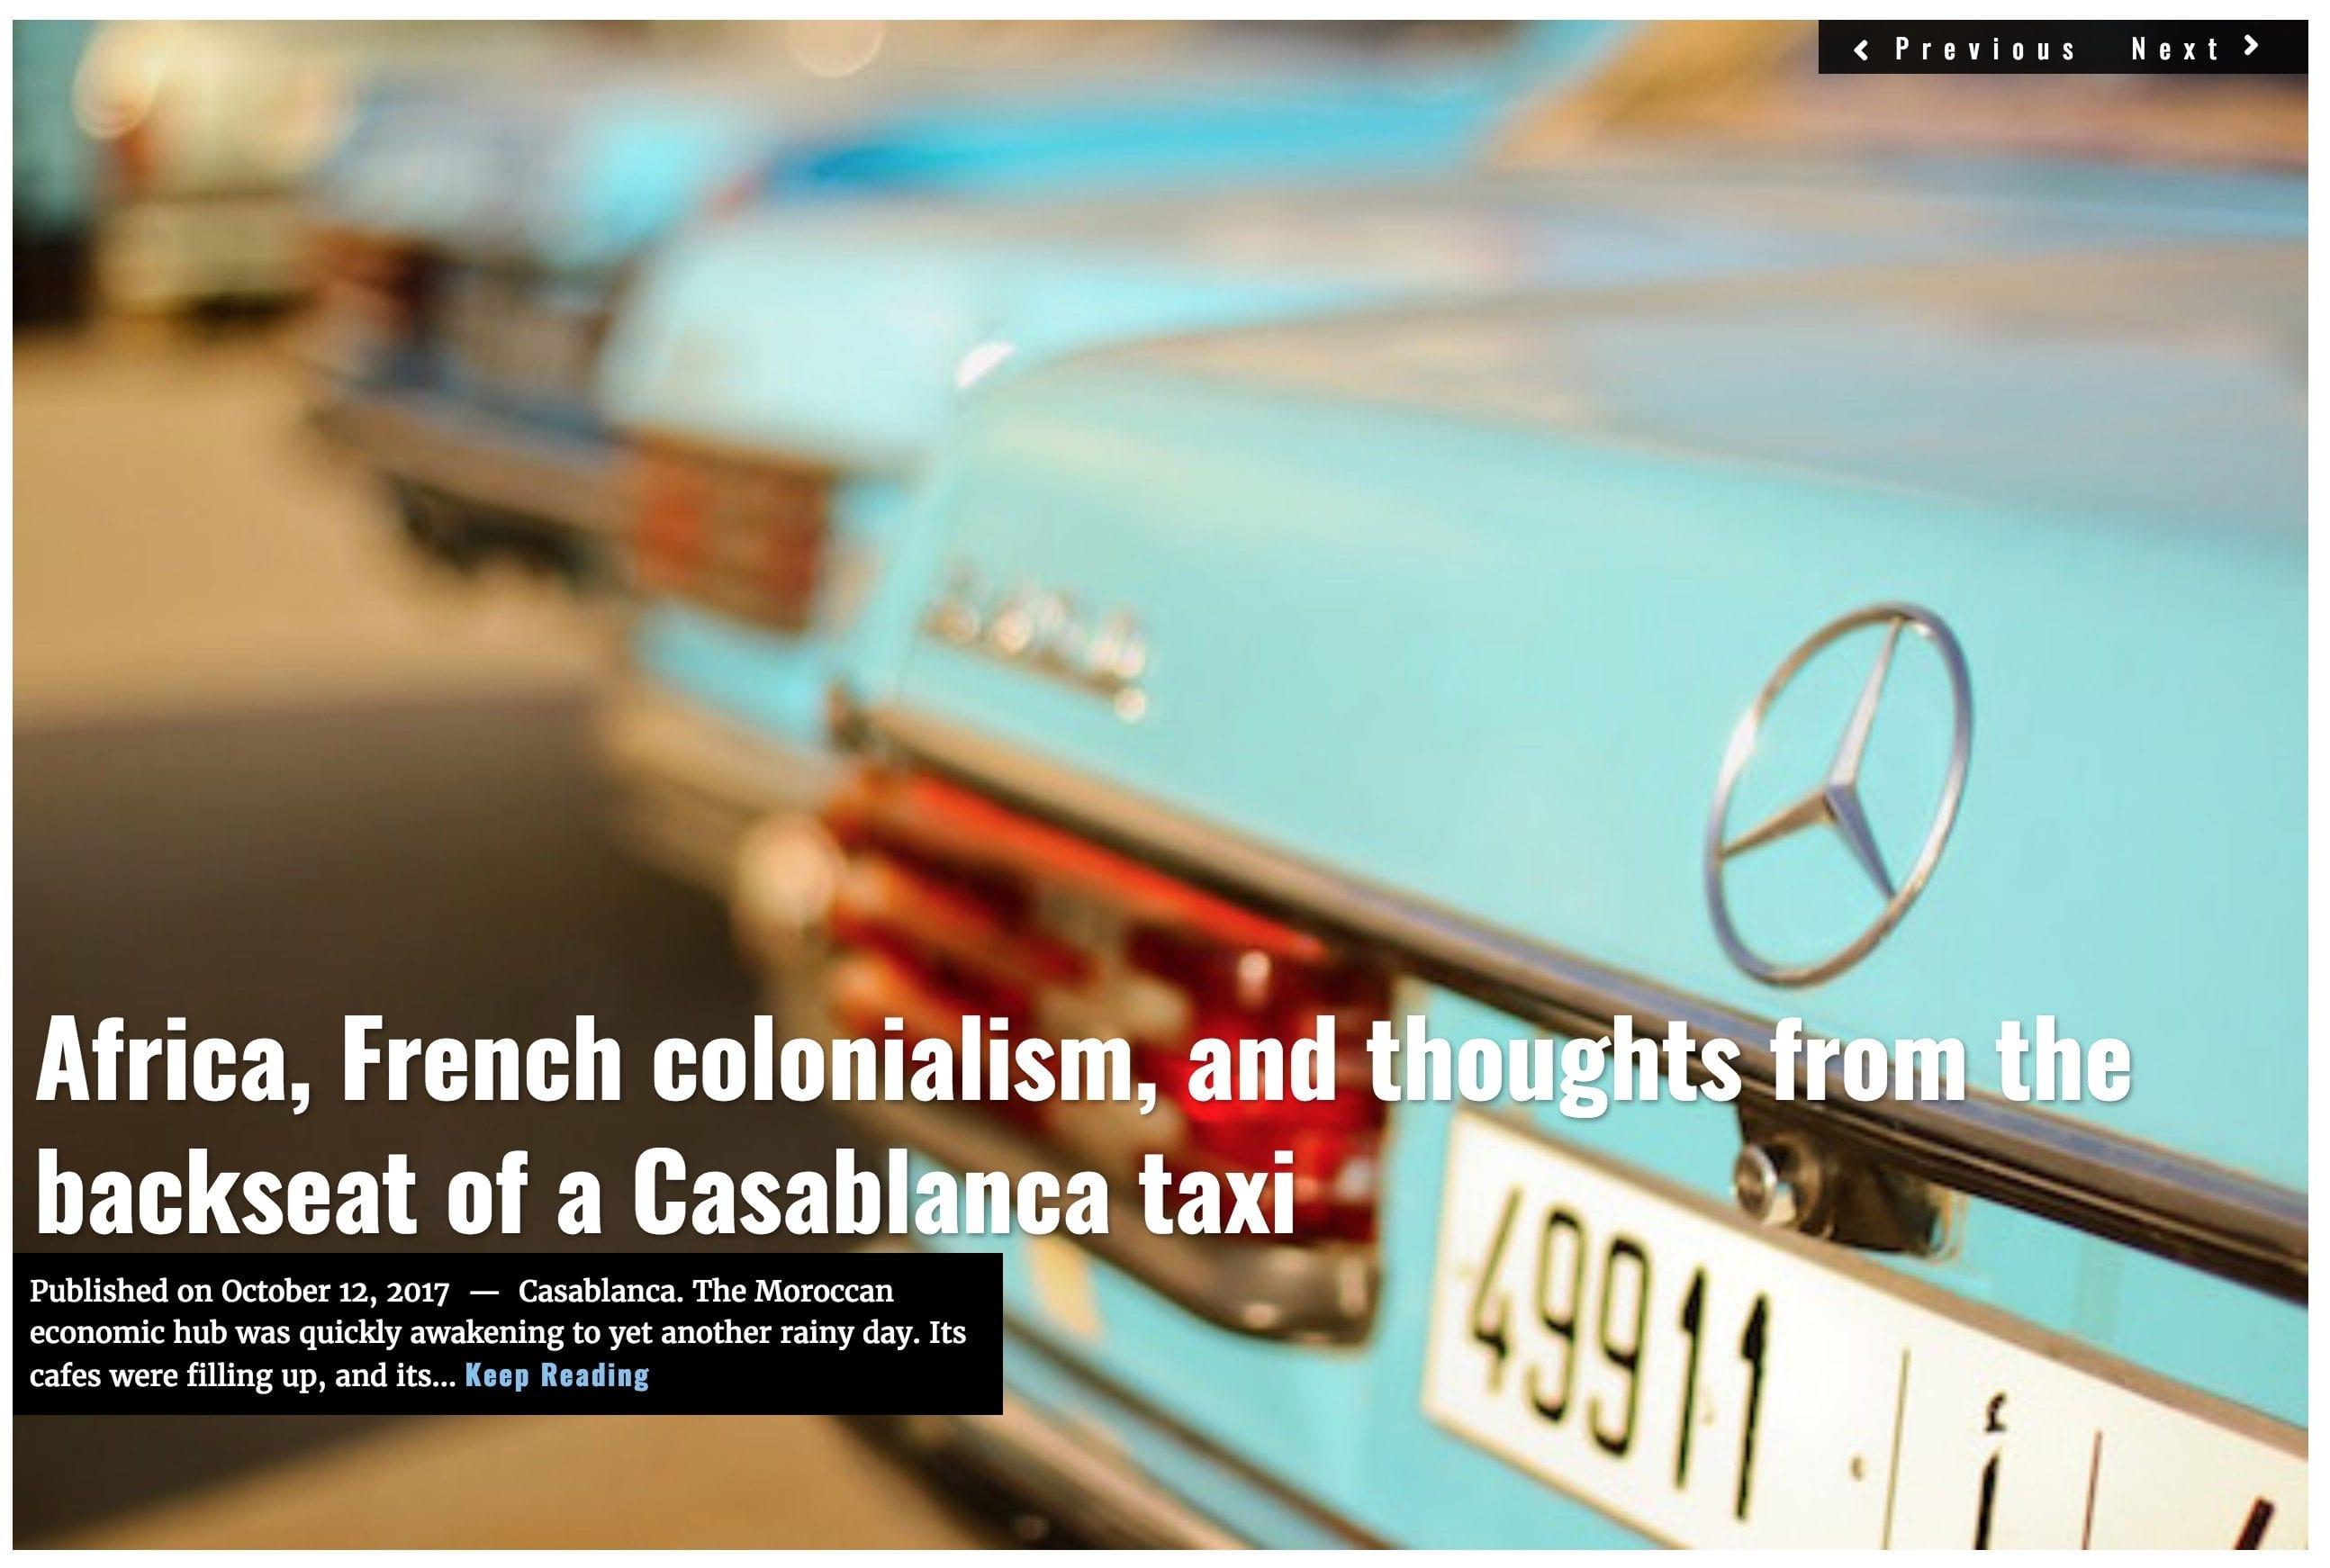 Image Lima Charlie News Headline Casablanca J.Sjoholm OCT 12